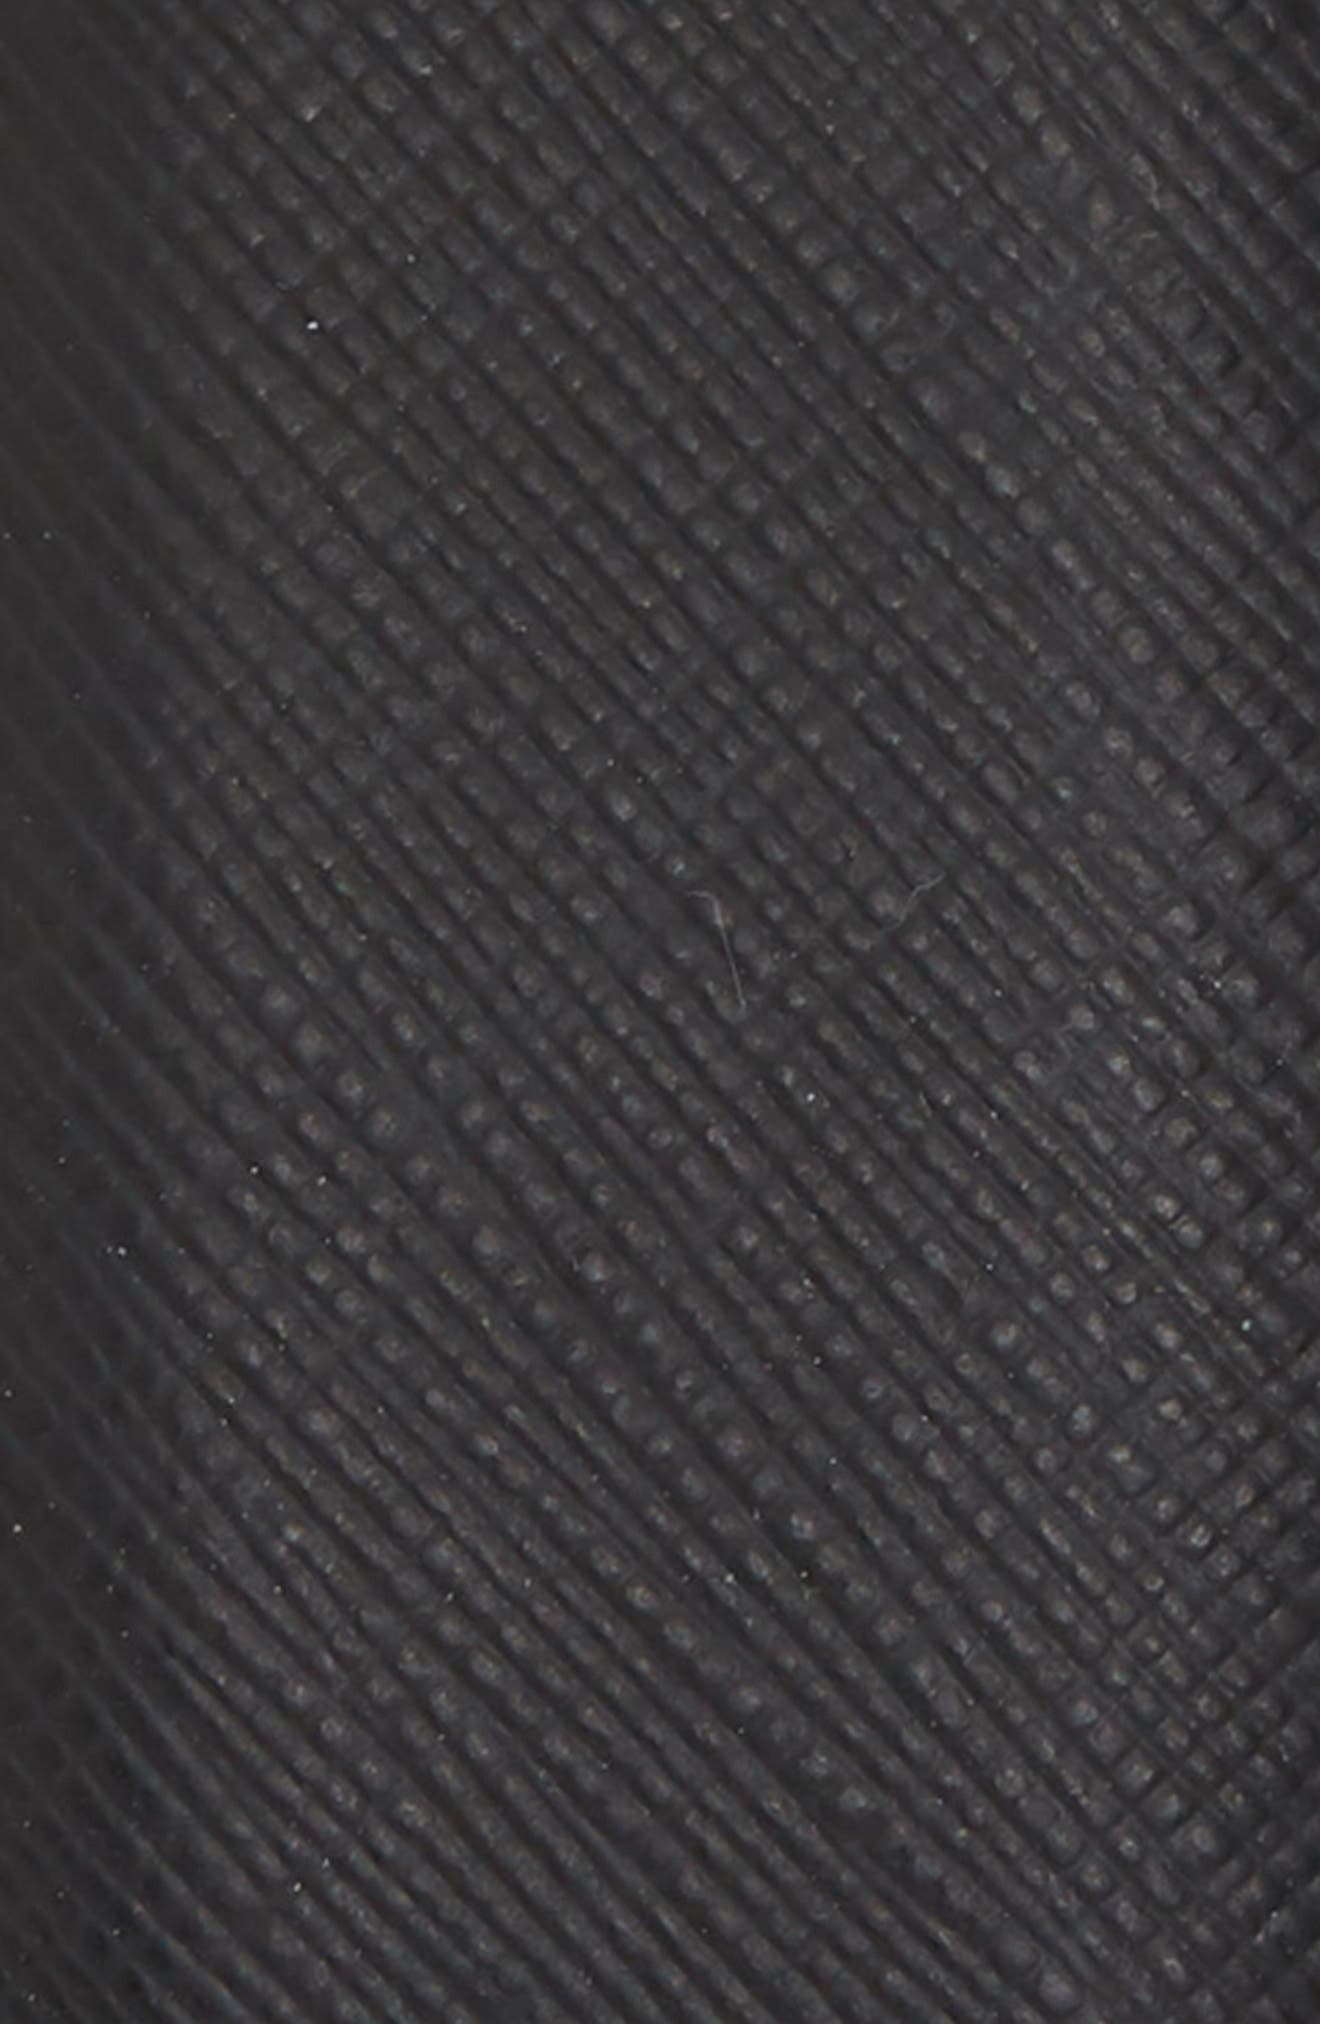 Saffiano Leather Belt,                             Alternate thumbnail 2, color,                             SAFFIANO BLACK